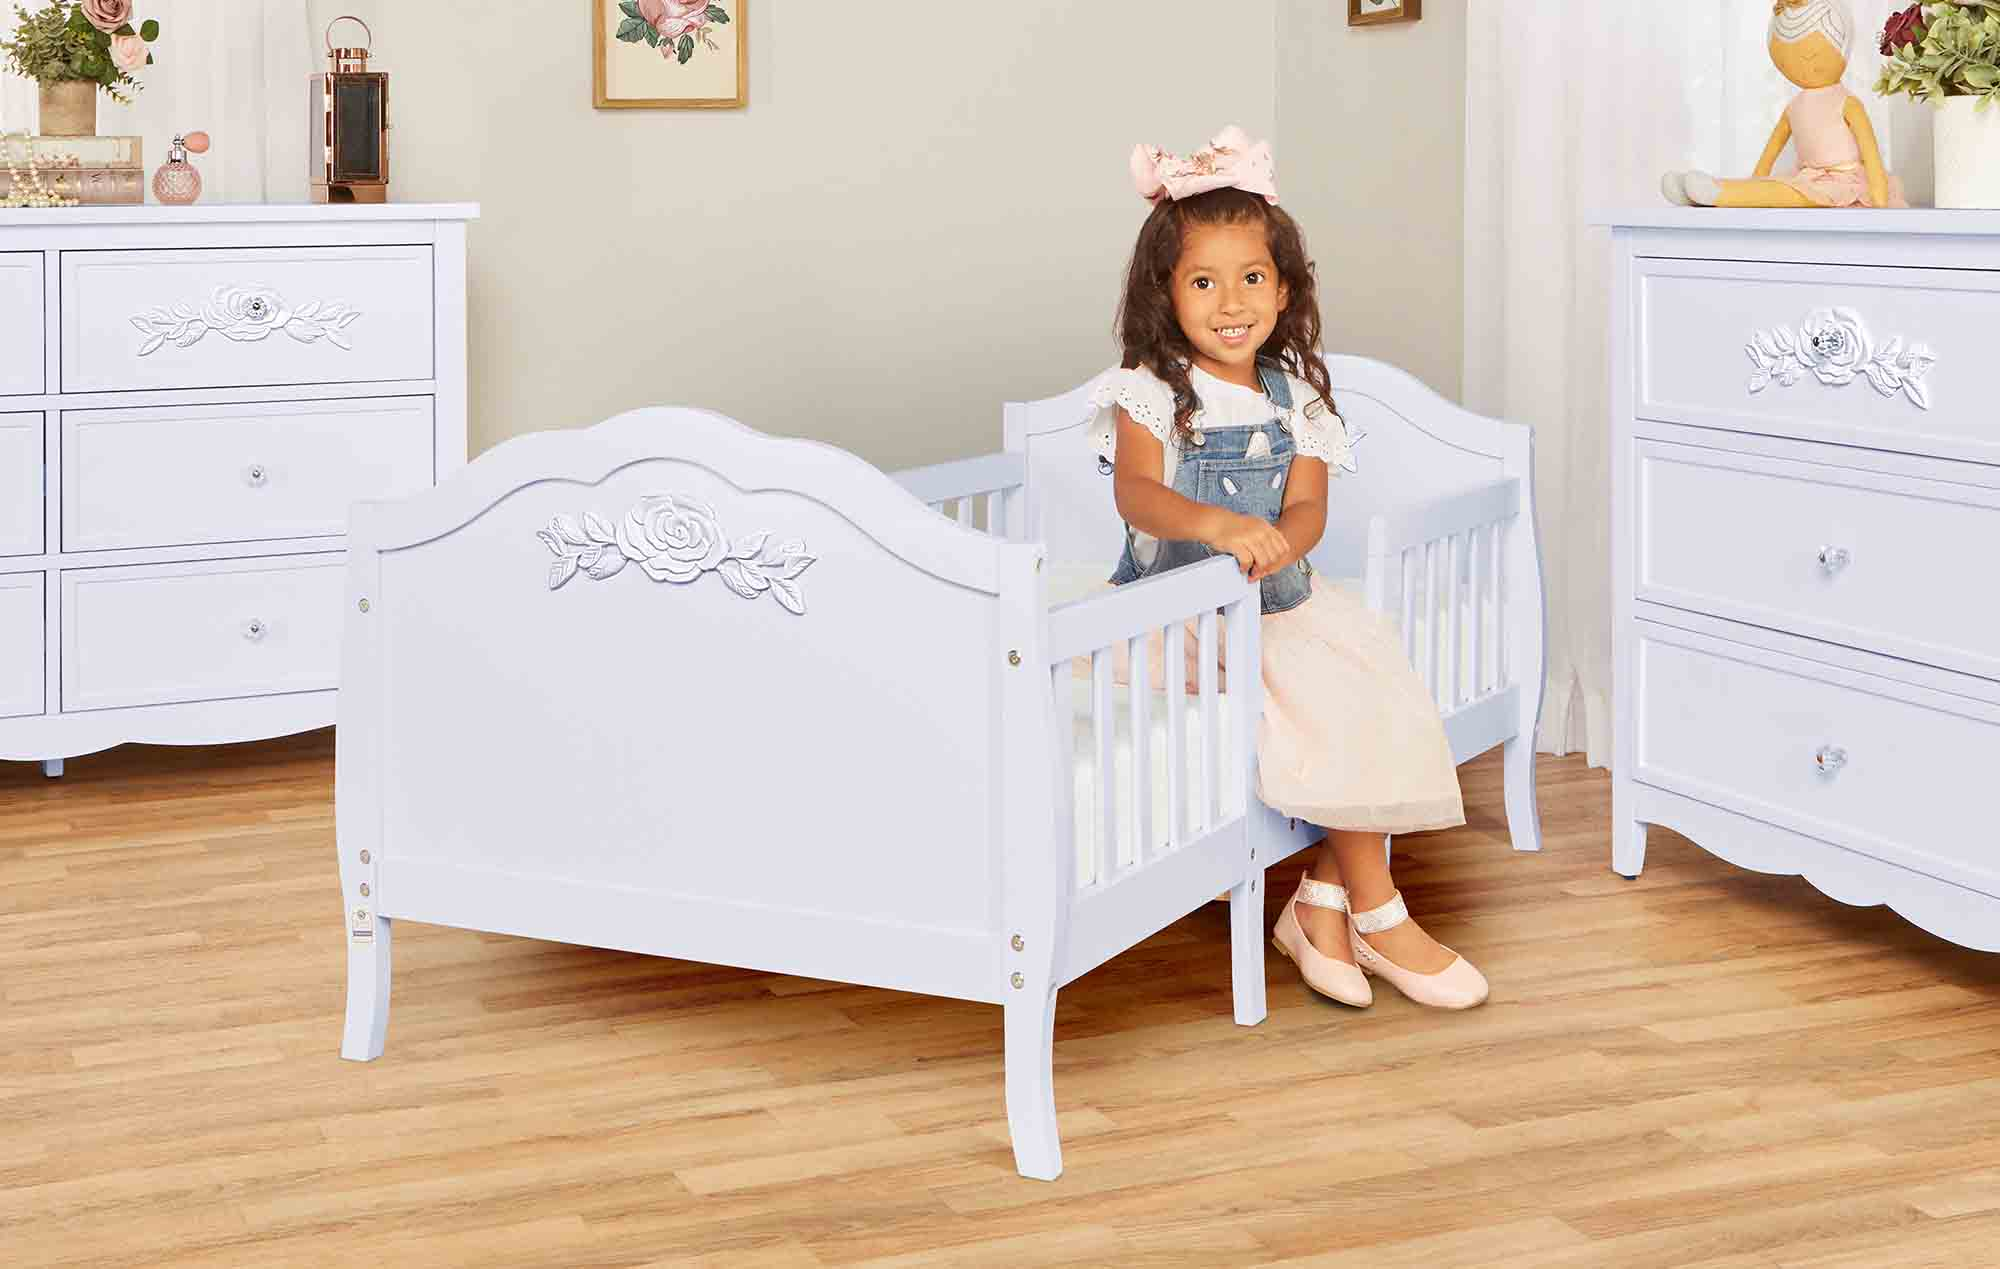 640_LAVD Rose Toddler Bed RmScene 05